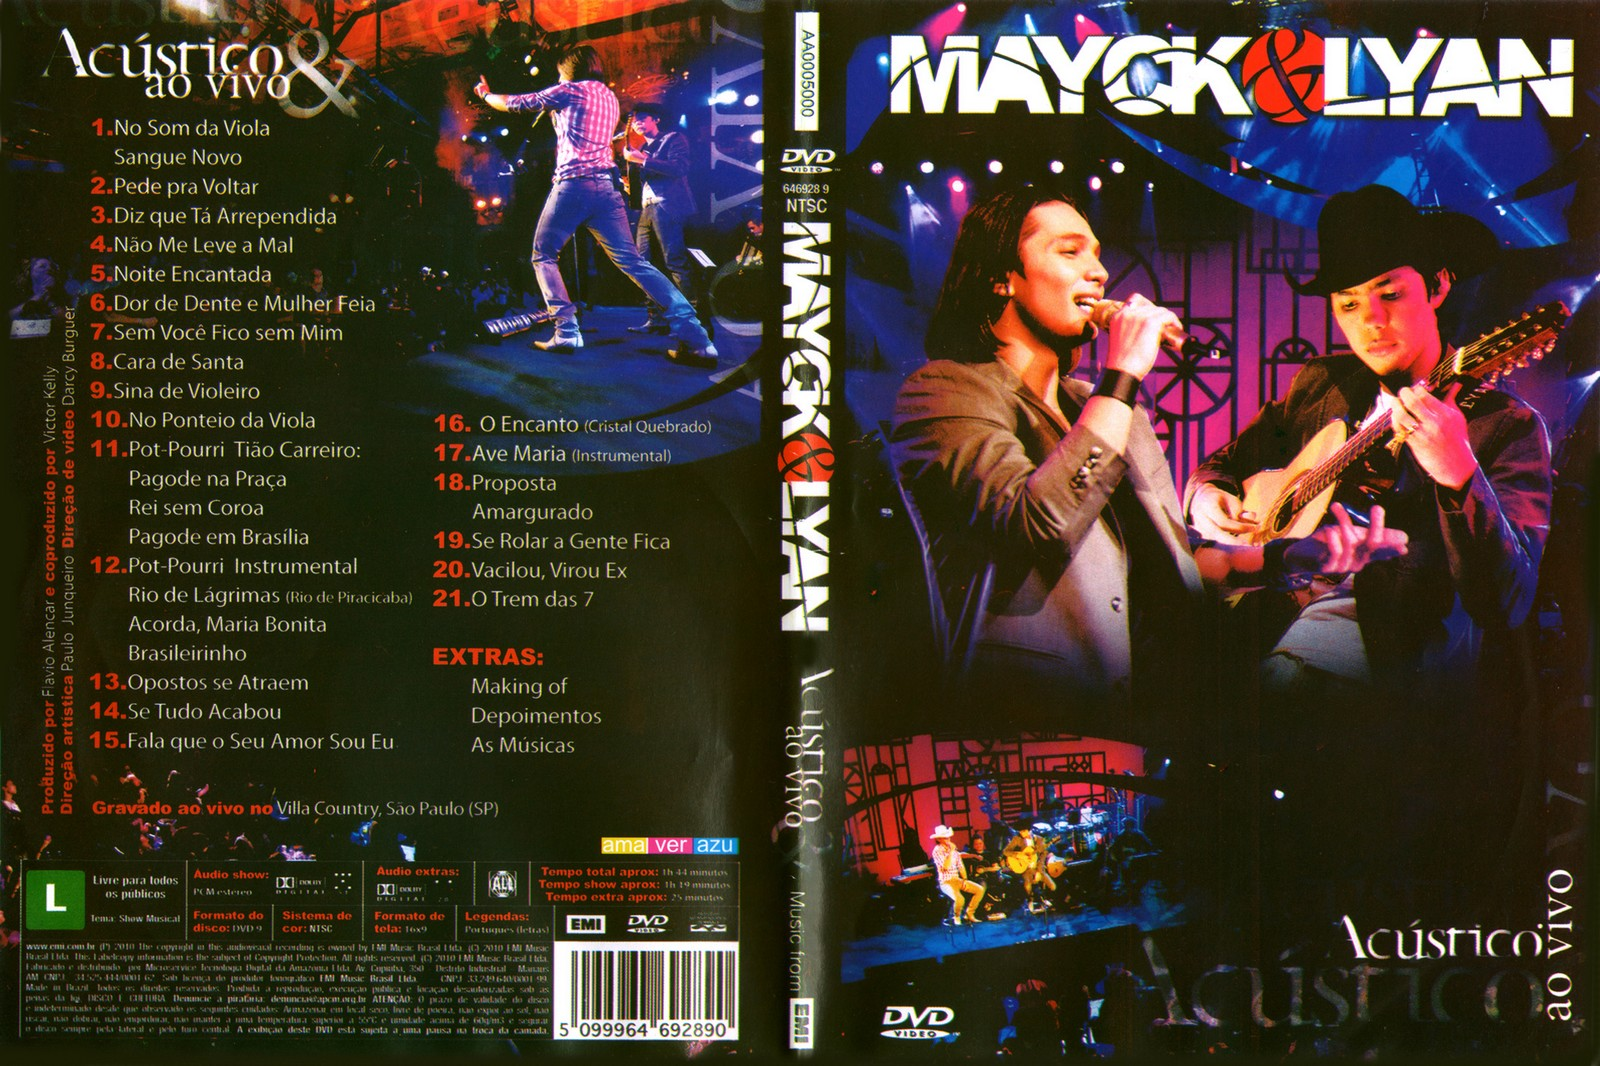 mayck & lyan acustico & ao vivo